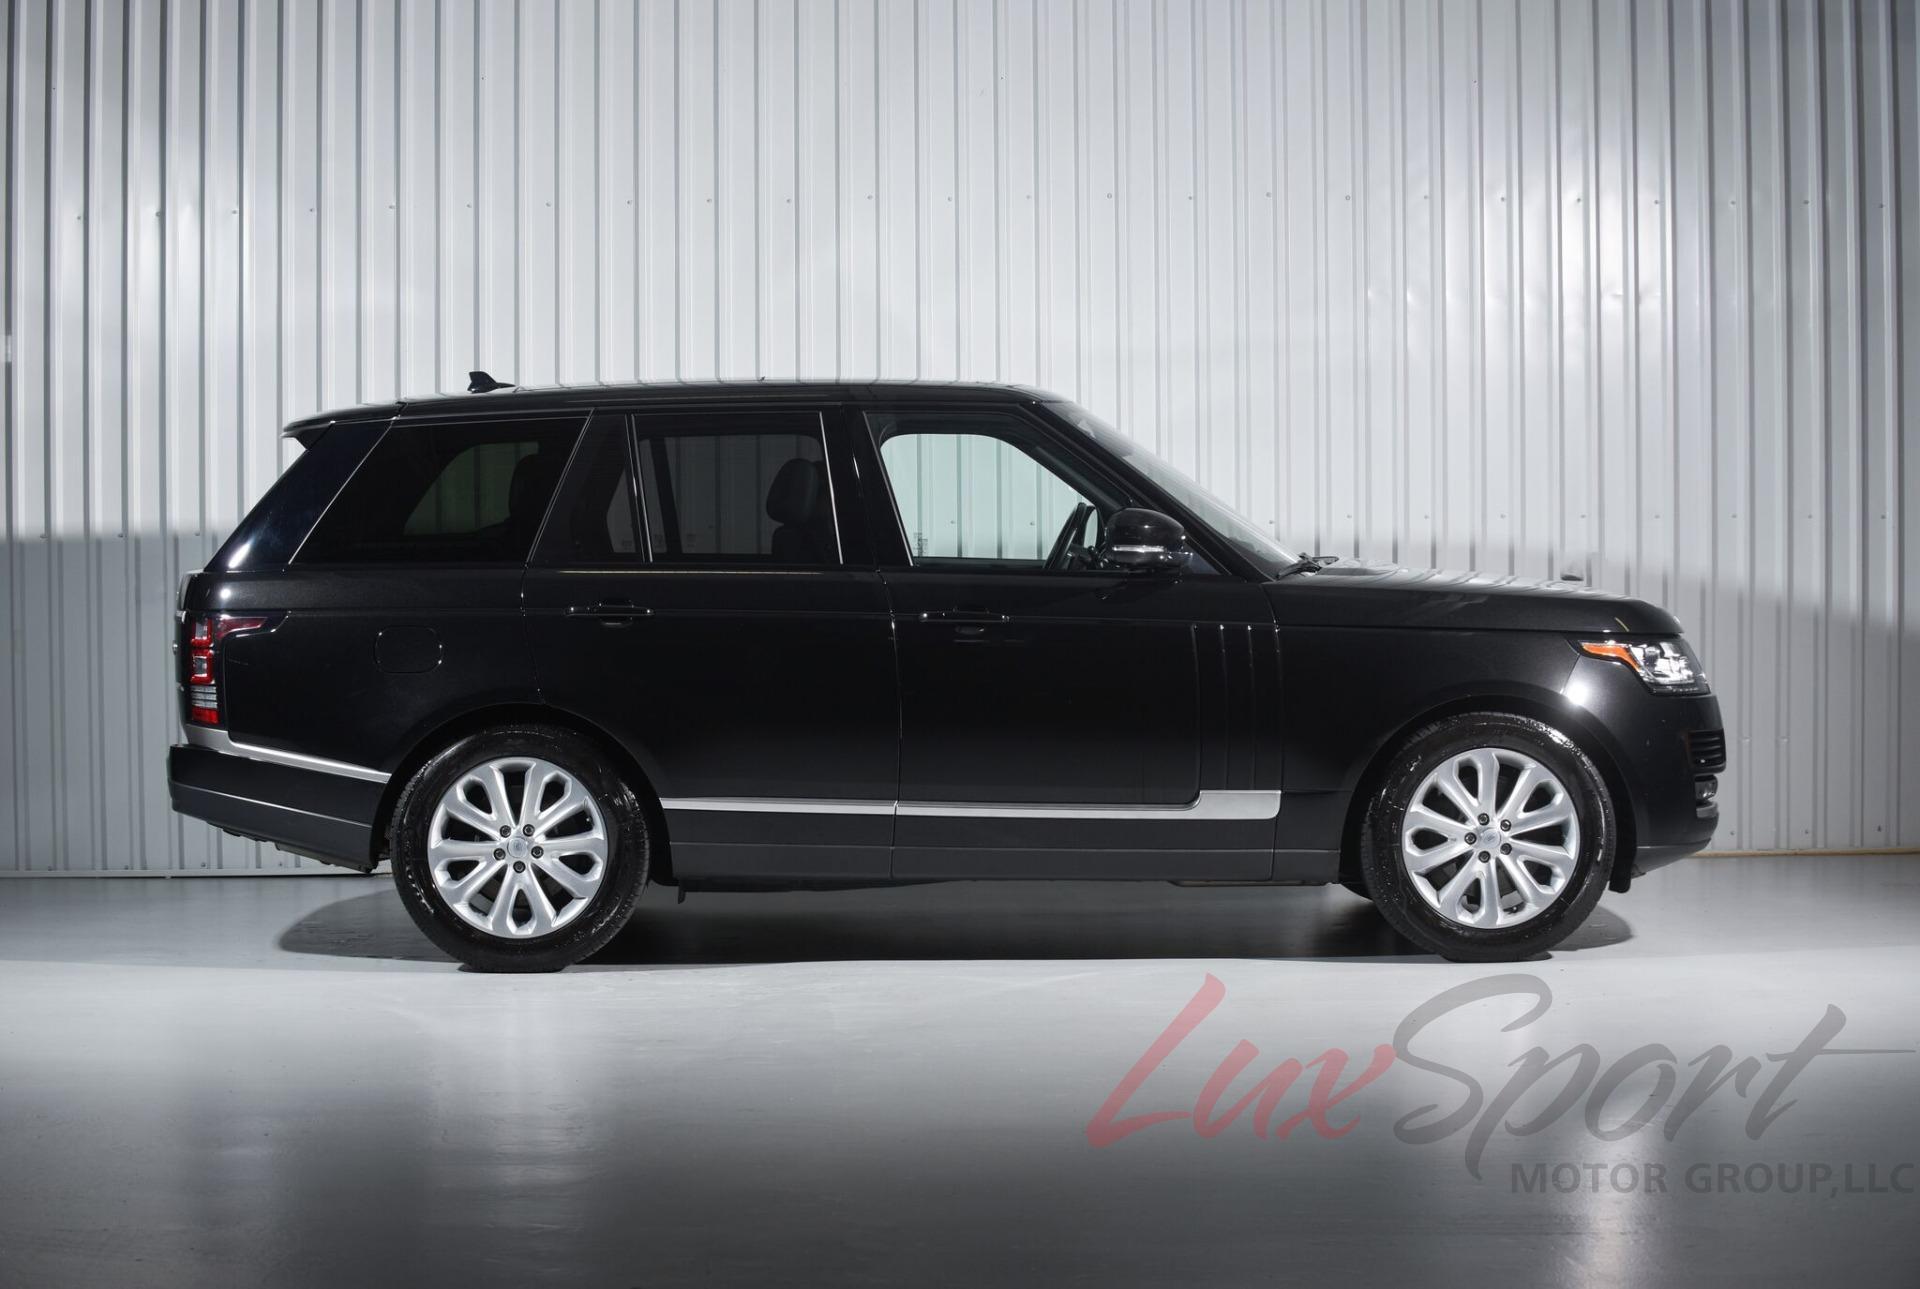 2016 Land Rover Range Rover Hse Santorini Black black Loaded $98k